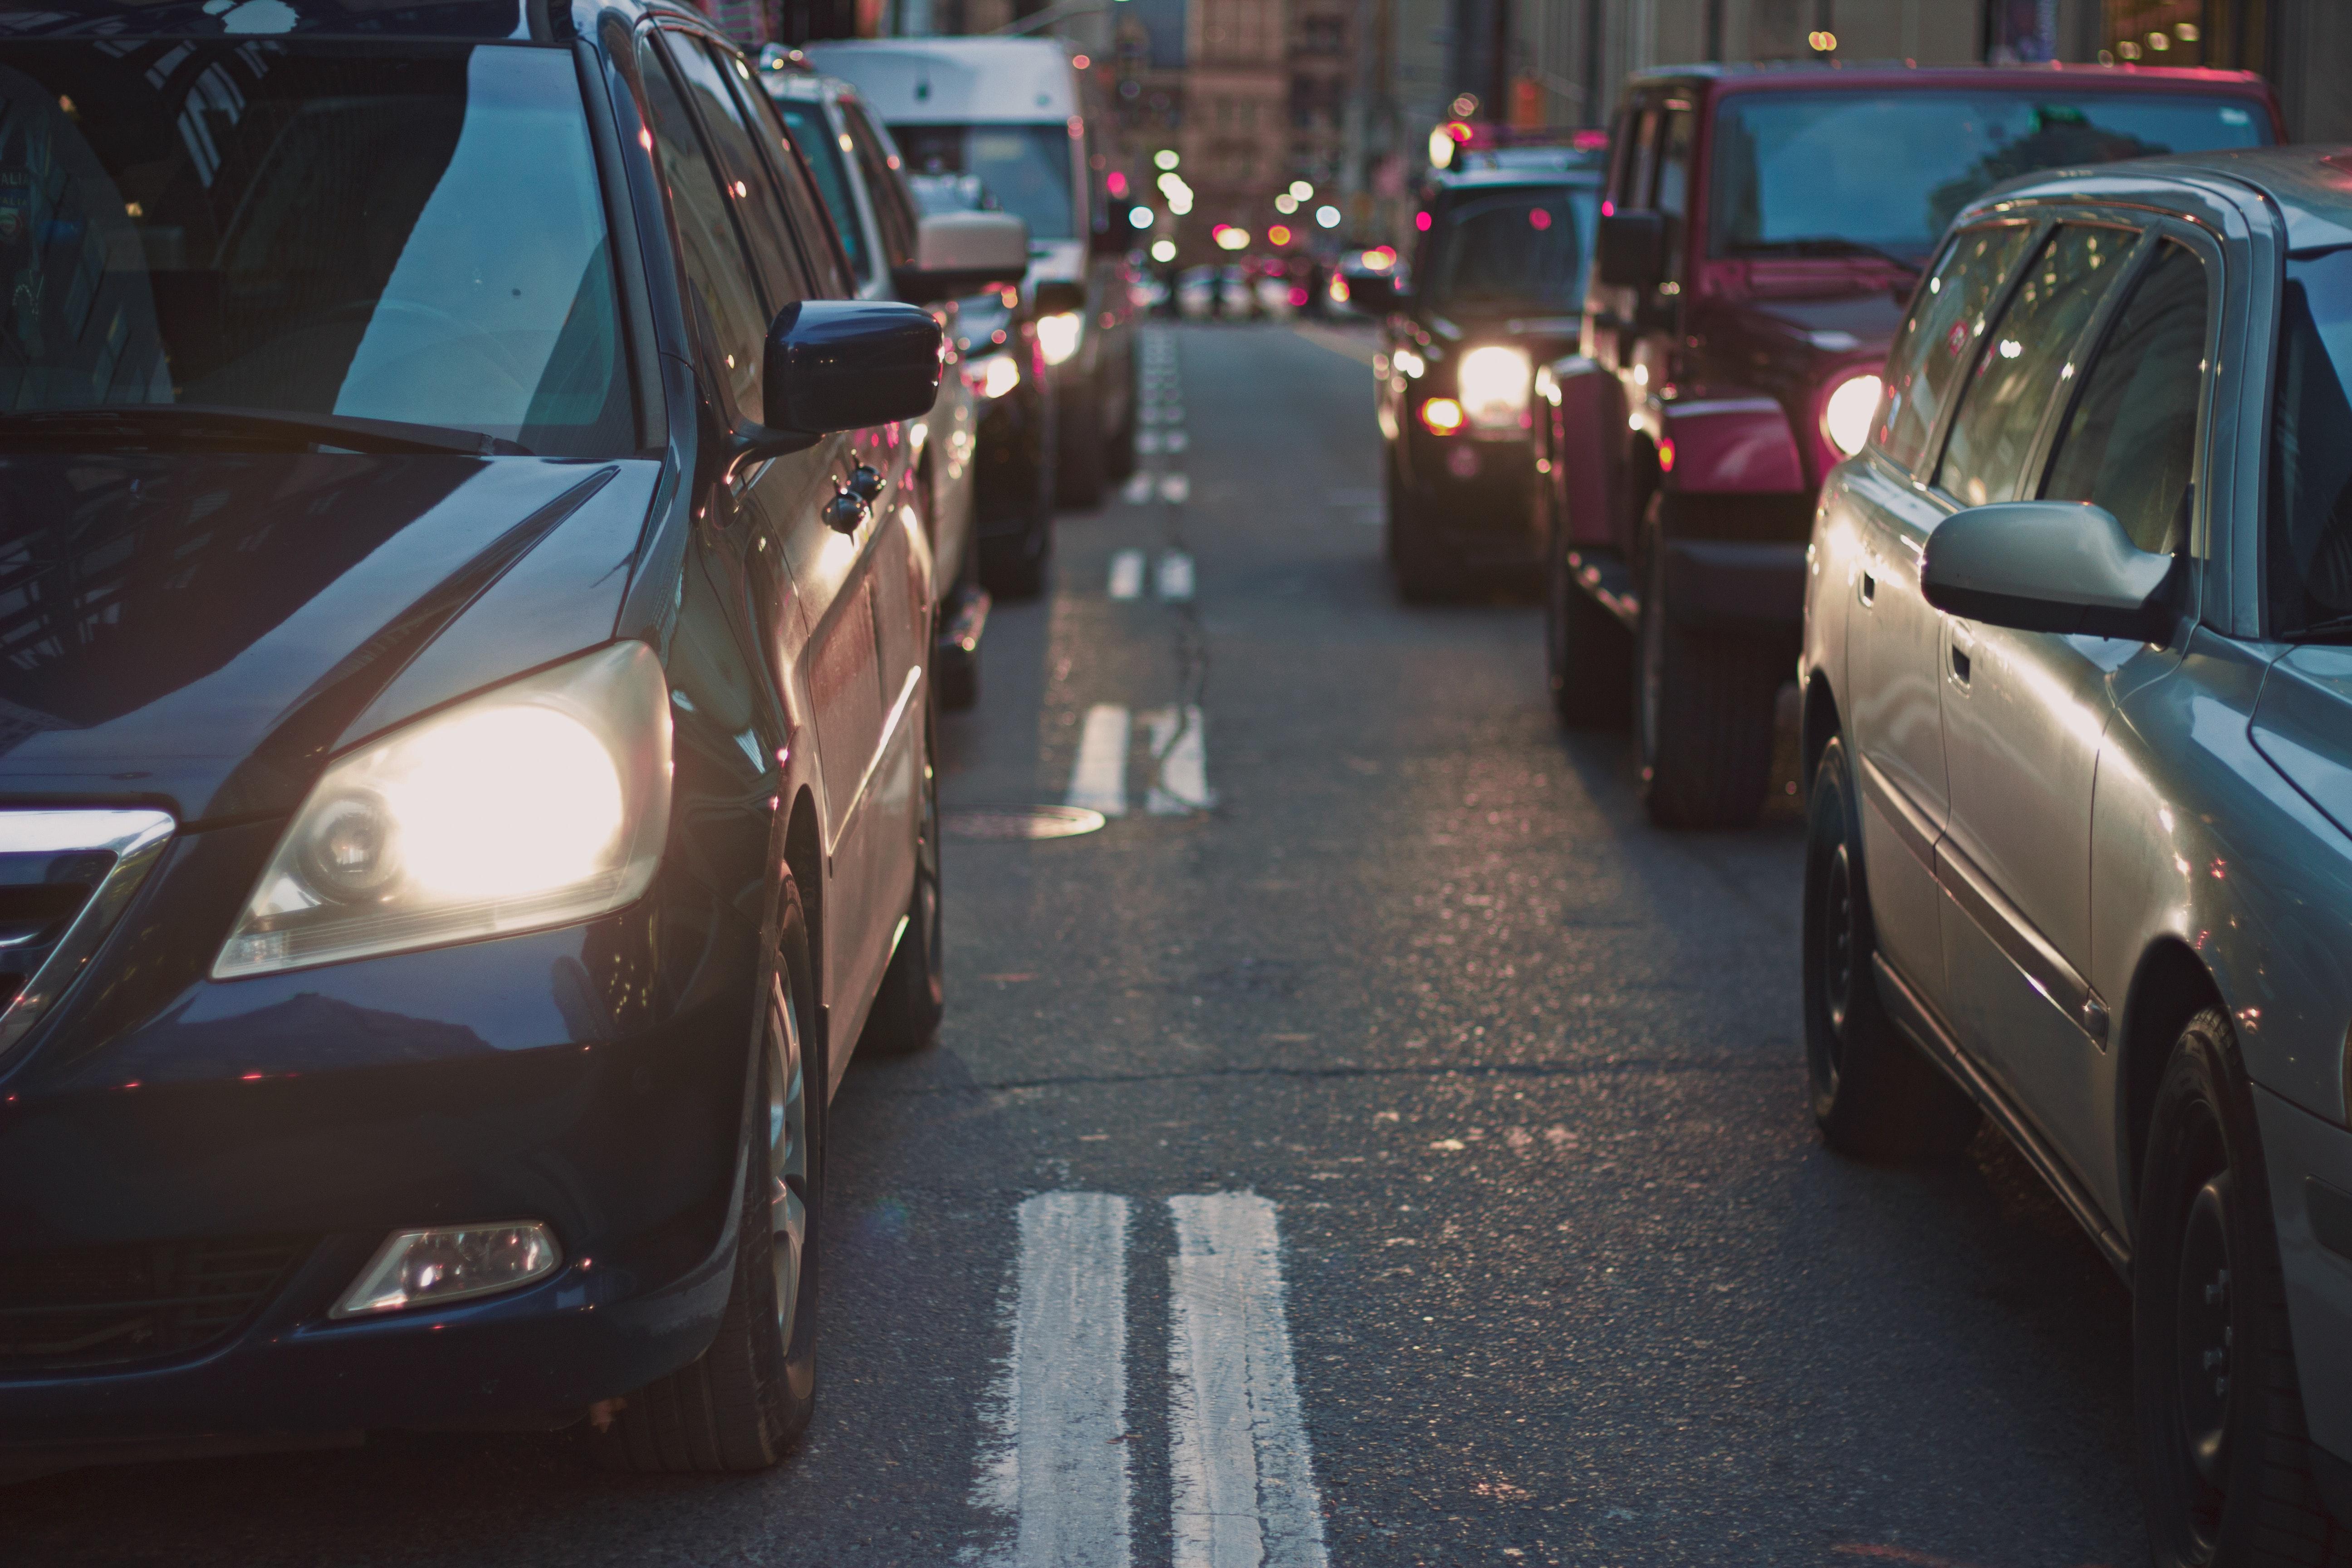 cars-congestion-street-7674